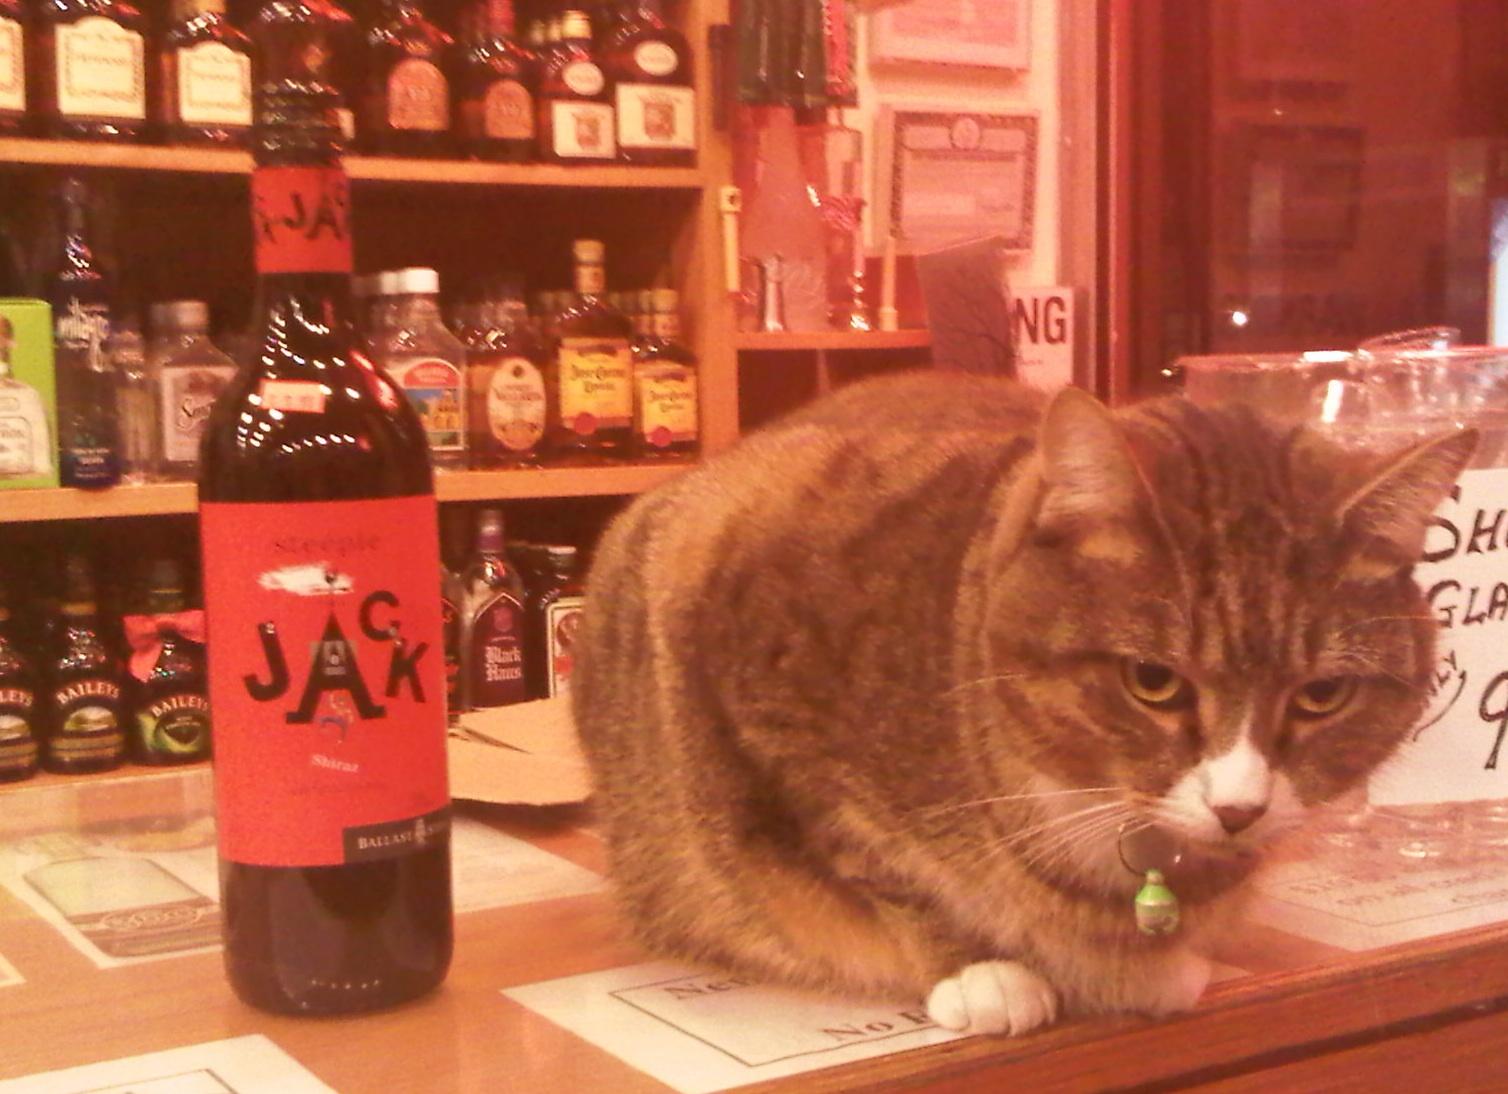 Jack the neighborhood wine store cat